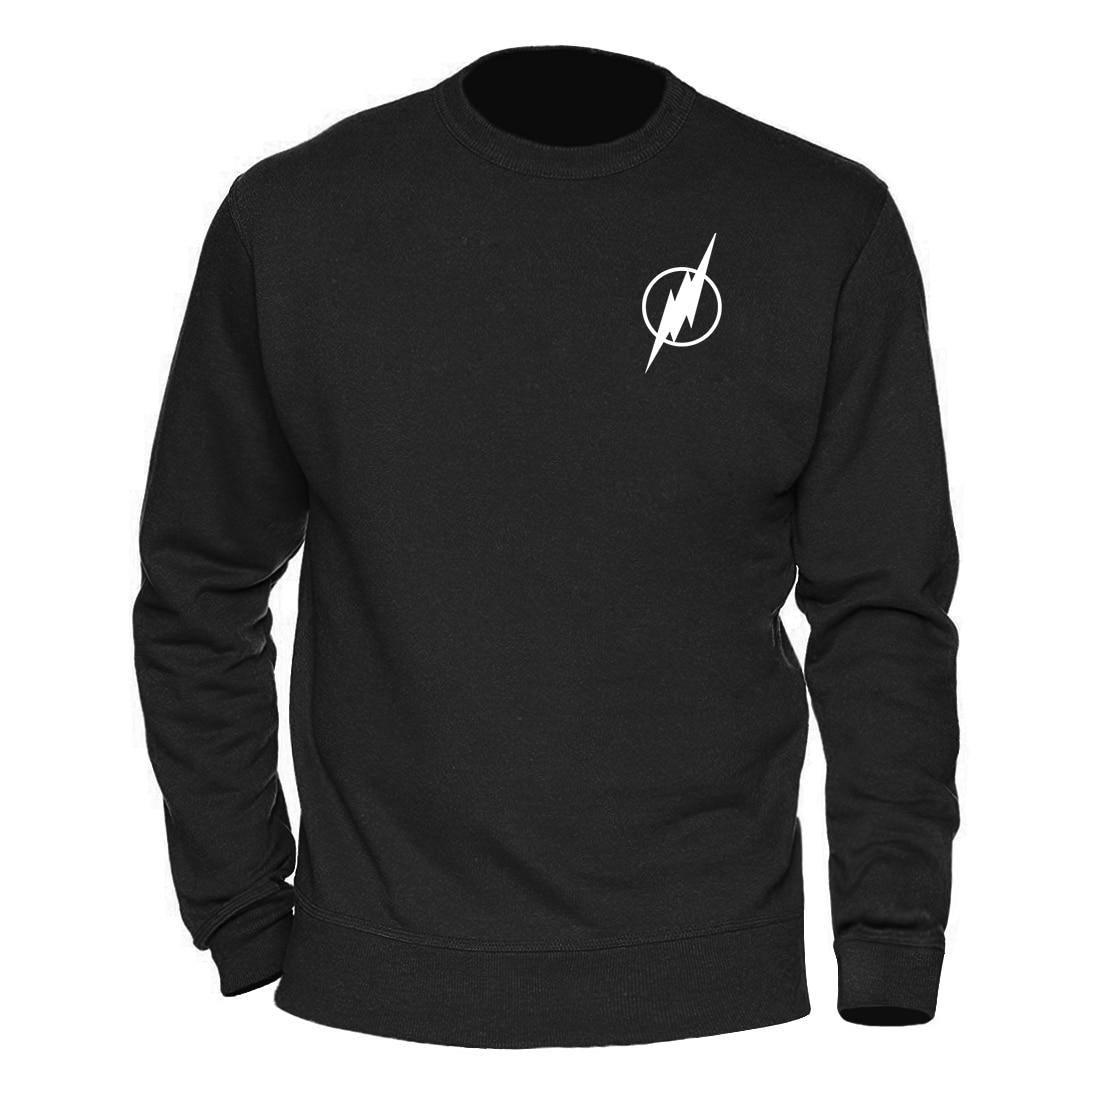 Superman Series Men's The Flash Sweatshirt Men Sweatshirts Man Winter Autumn Warm Graphics Design Streetwear Mens Clothing